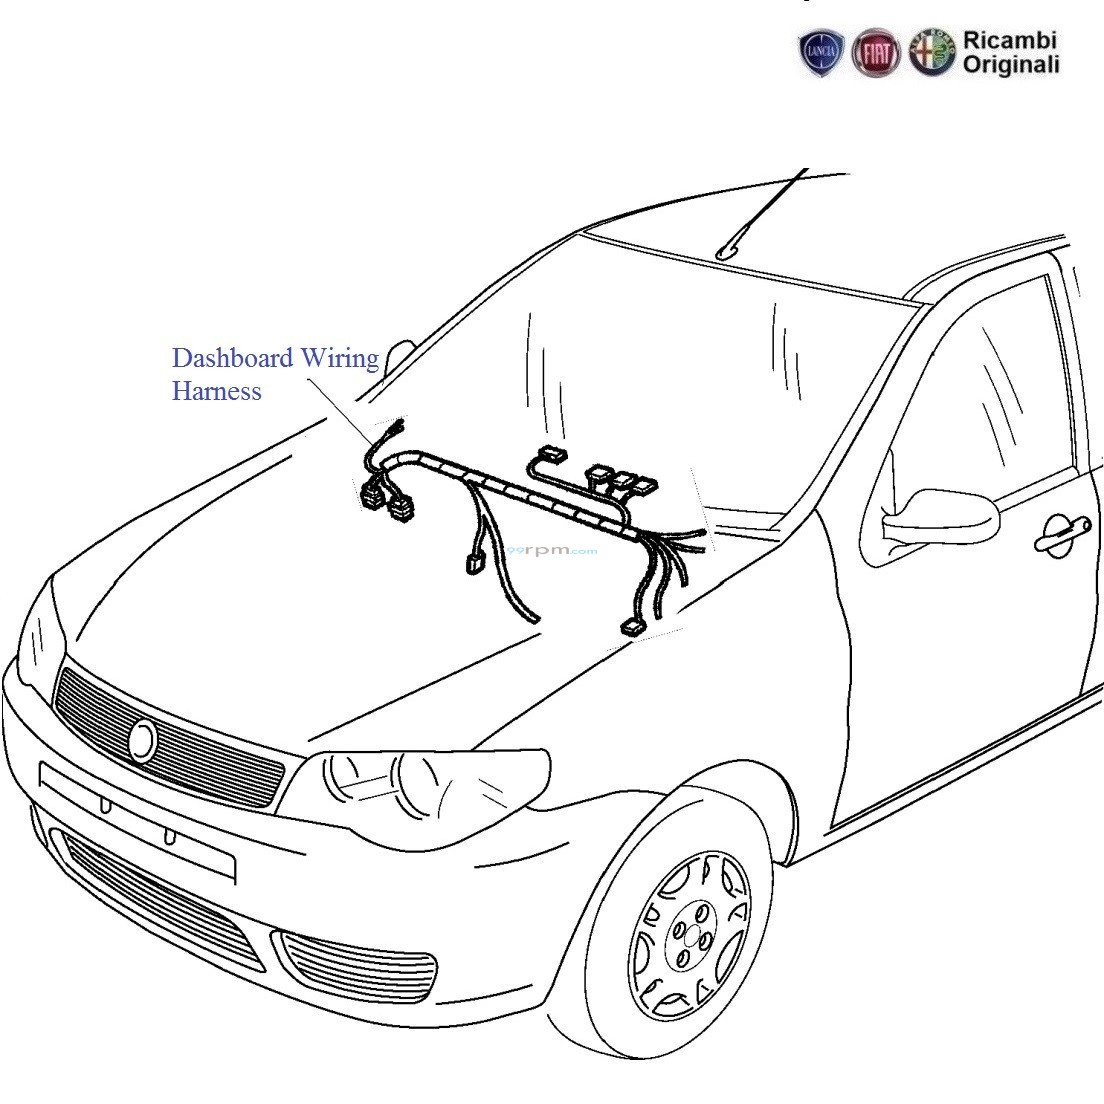 Fiat Palio Stile 11 Petrol Dashboard Wiring Harness